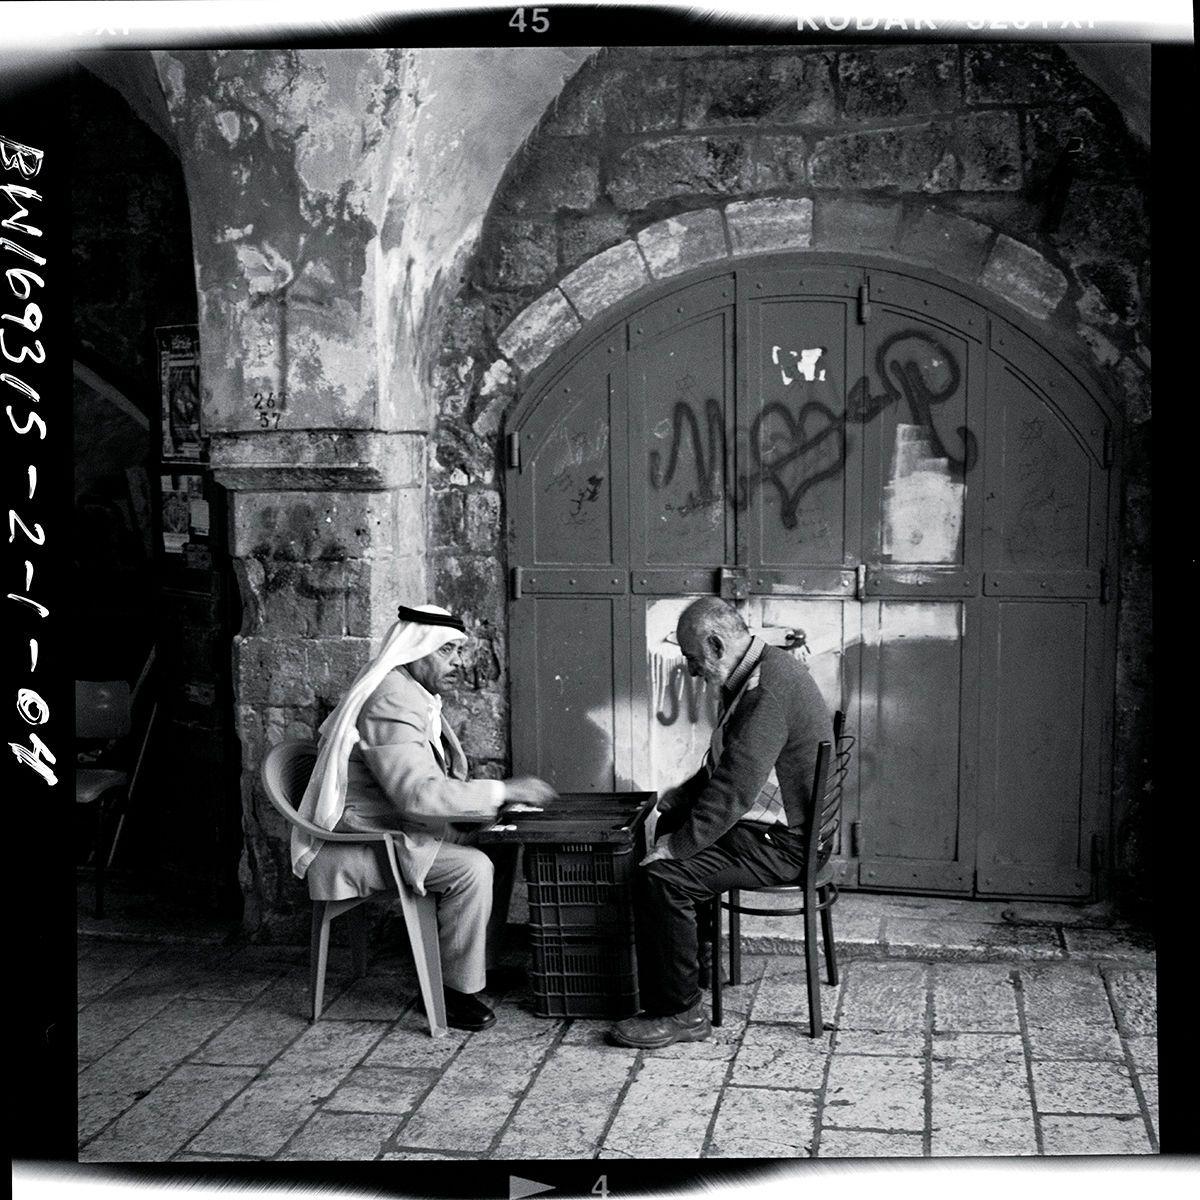 Jerusalem, 2009